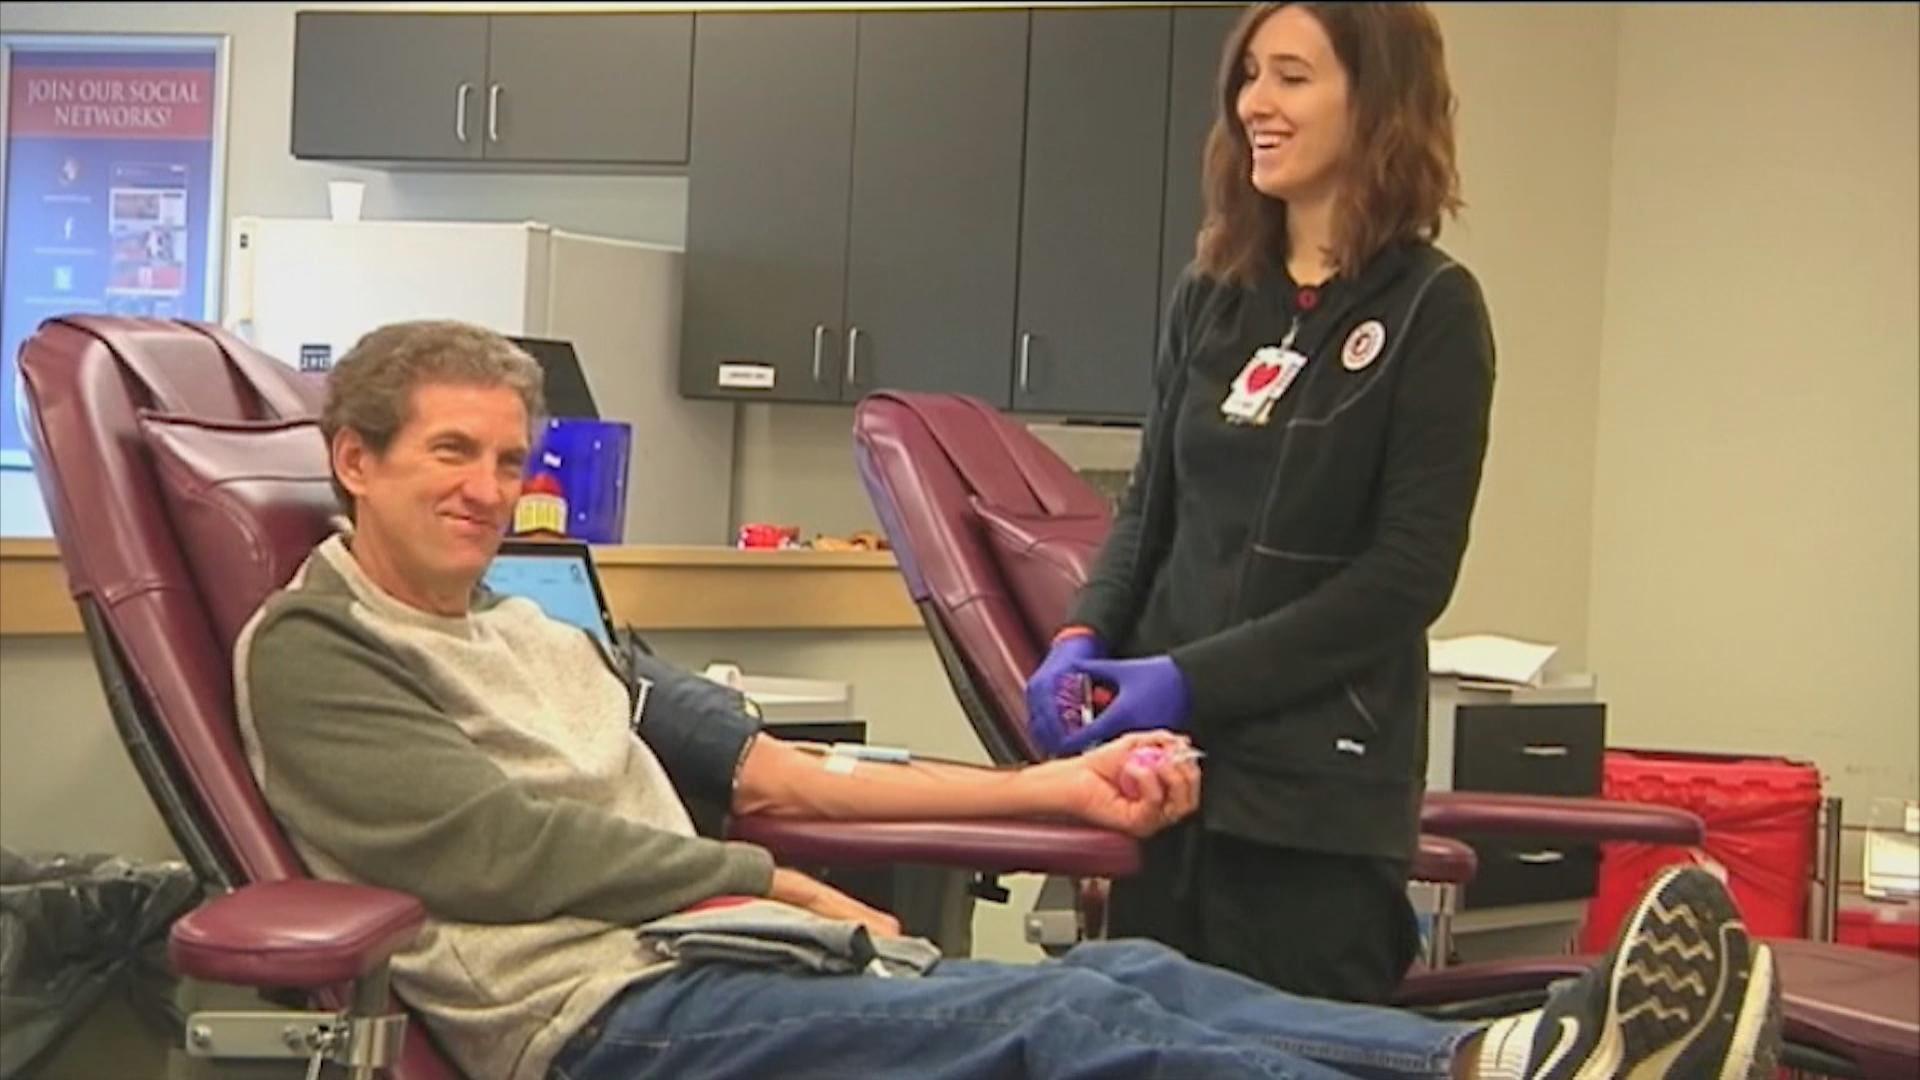 blood donation_1484865081404.jpg